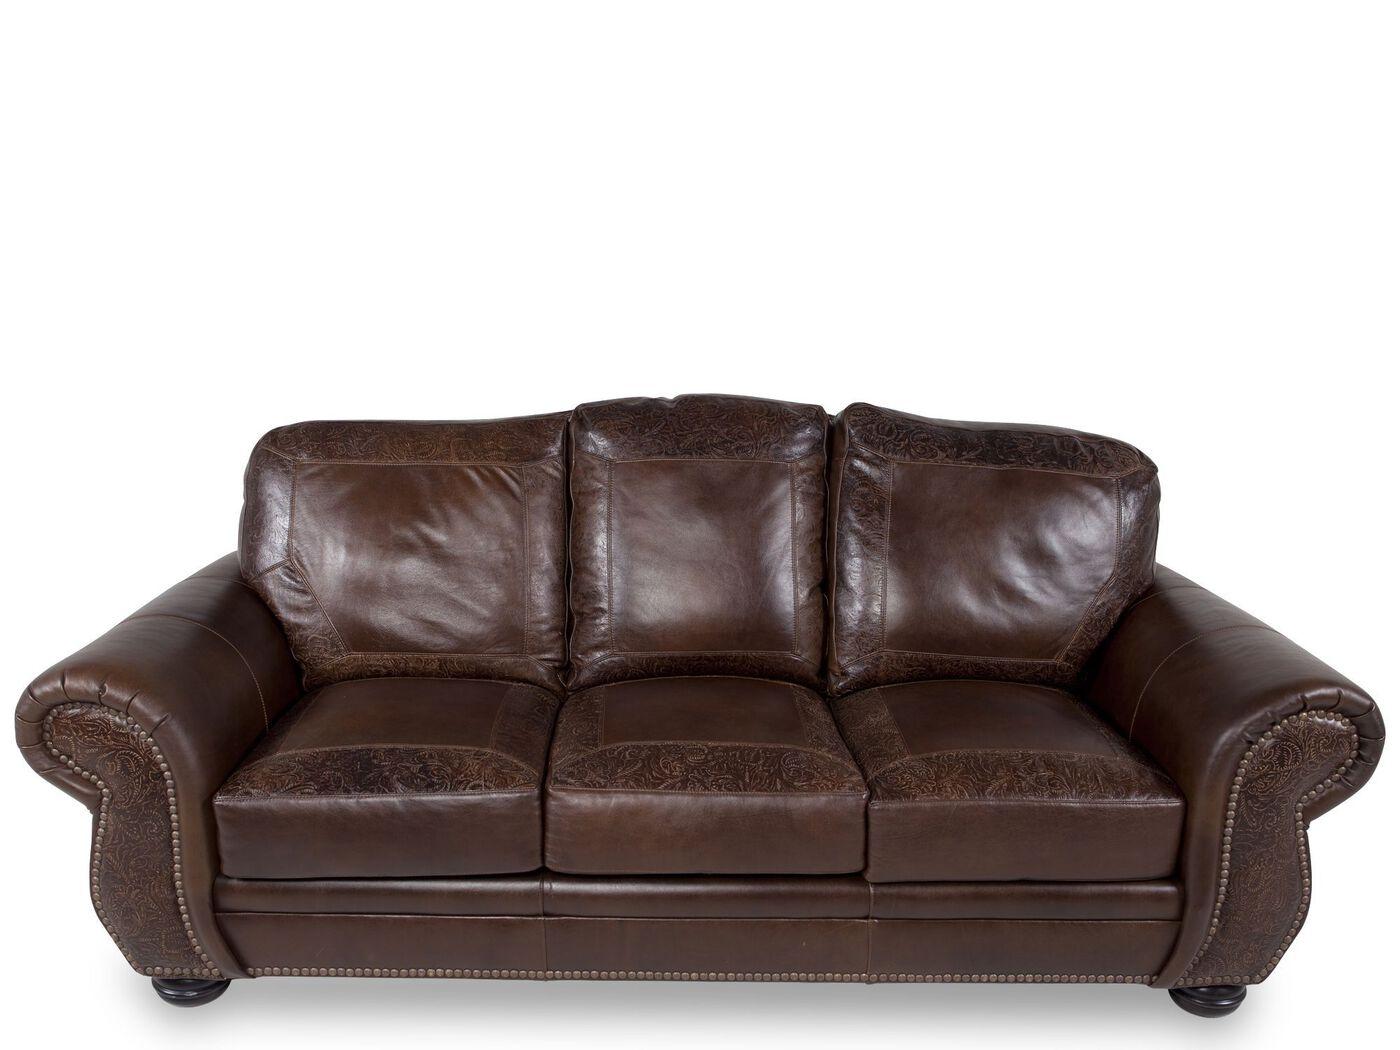 paisley furniture. Images Paisley-Printed Leather 94\u0026quot; Sofa In Dark Burgundy Paisley Furniture